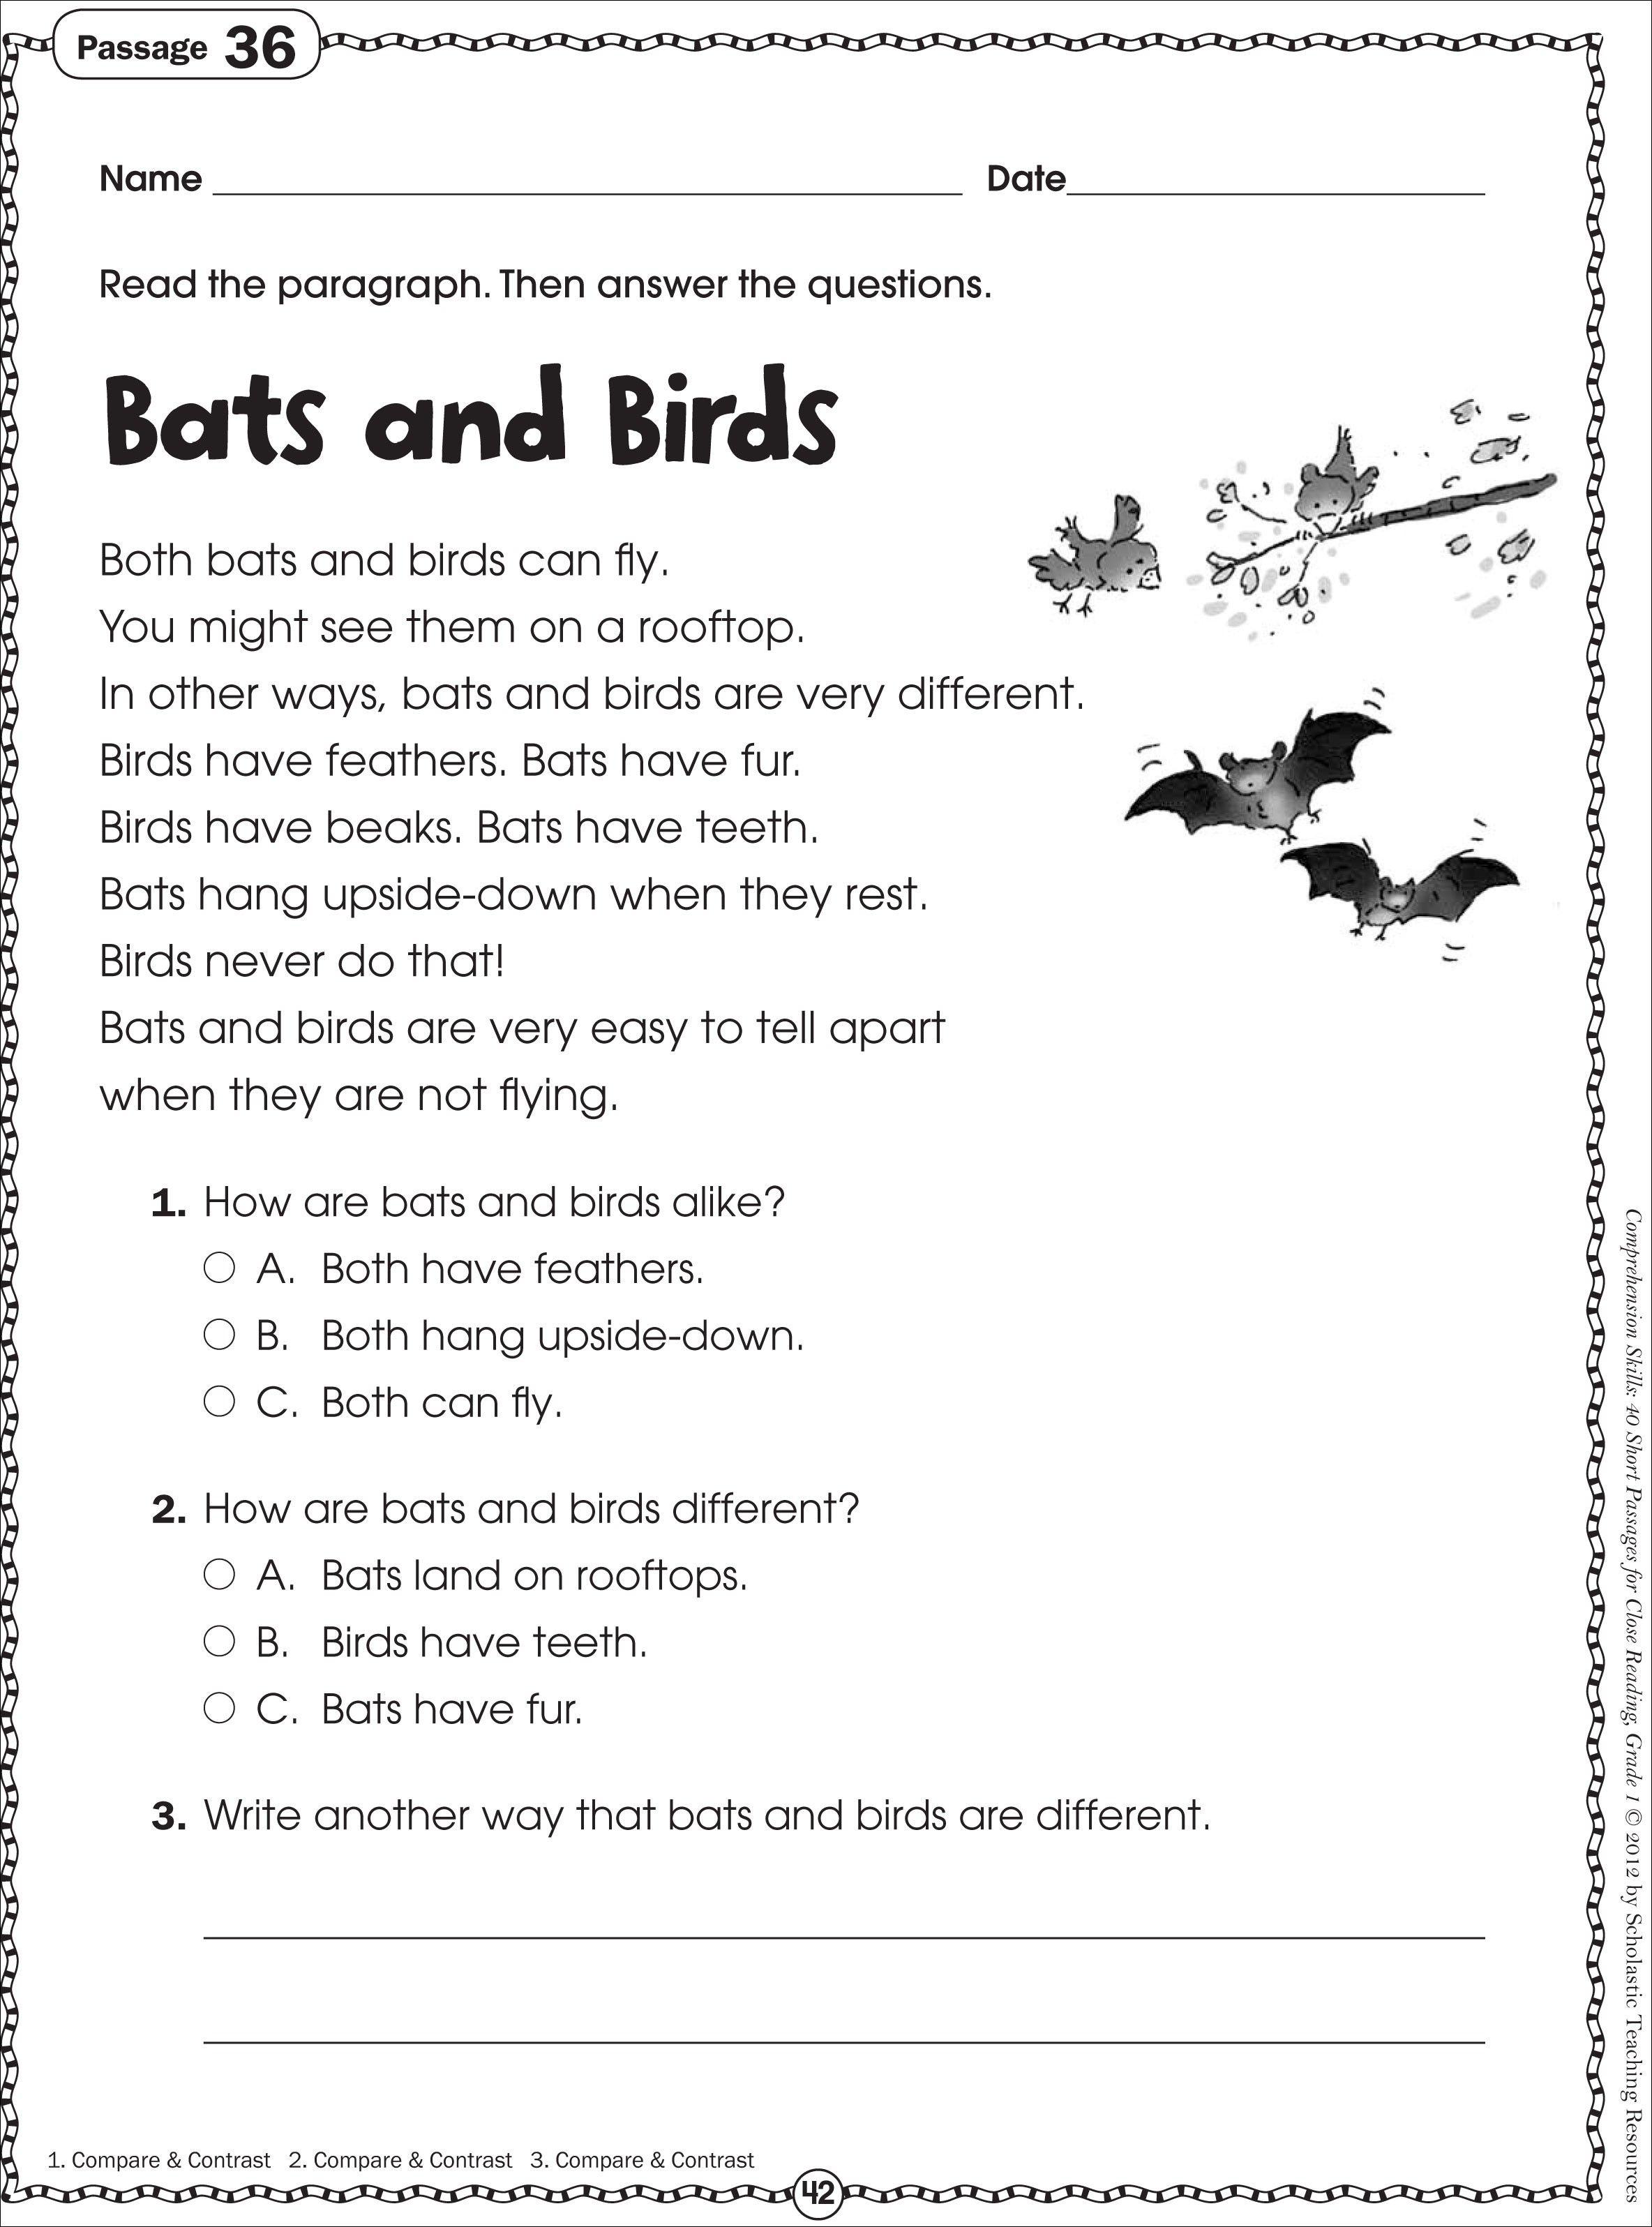 Free Printable Reading Comprehension Worksheets For Kindergarten - Free Printable Short Stories For 4Th Graders